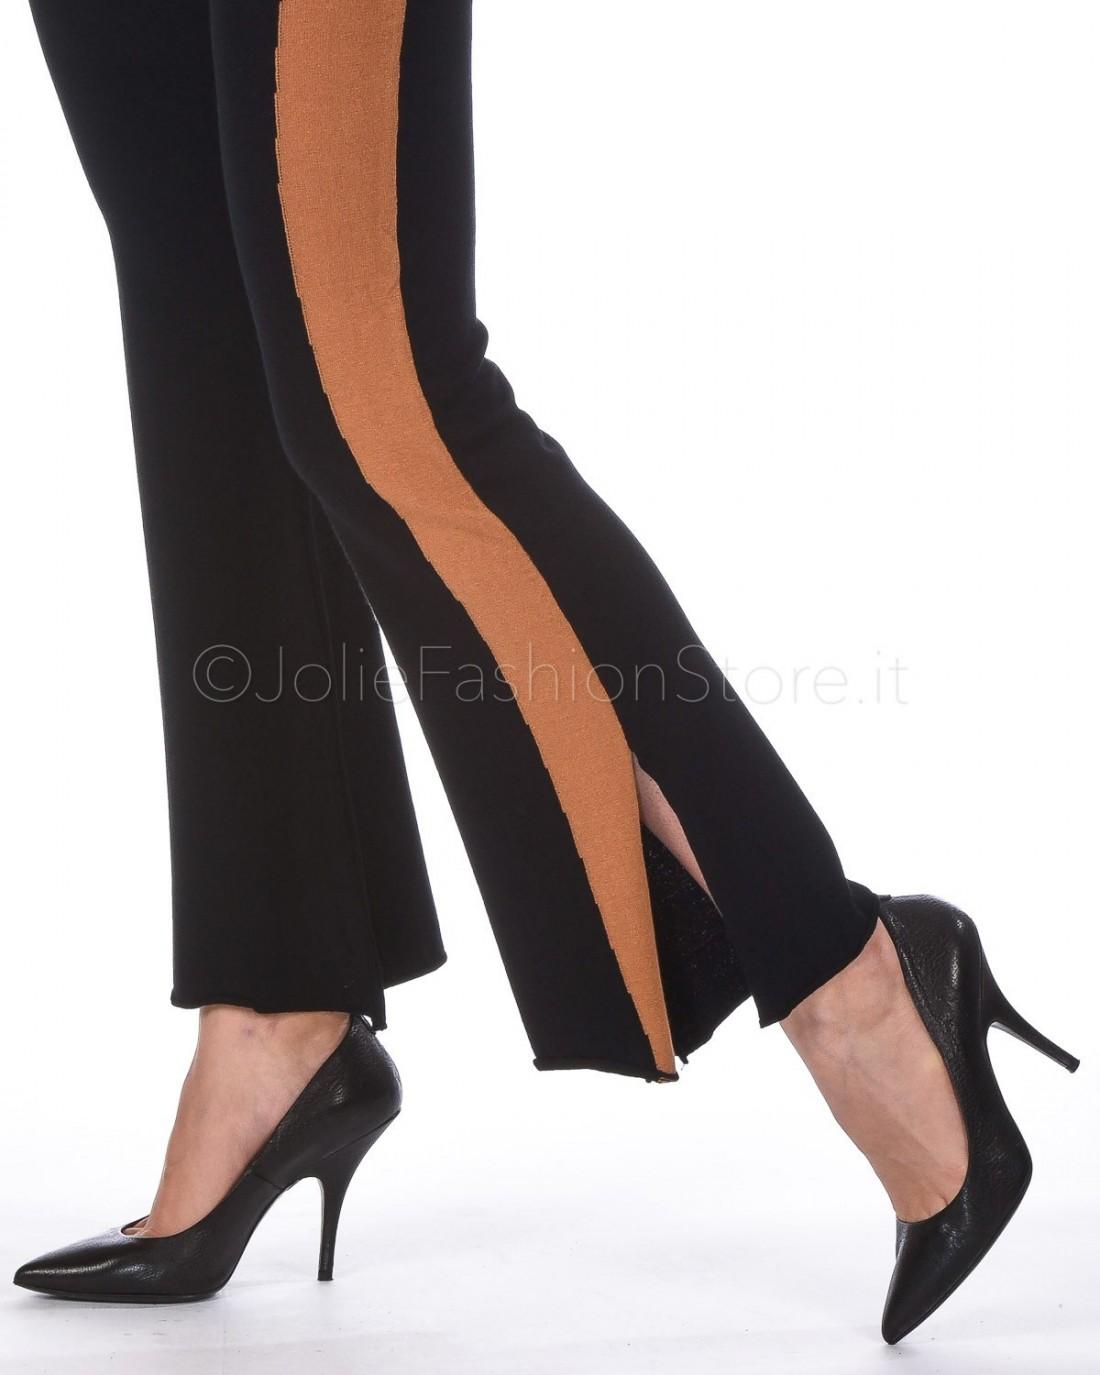 3.7 Pantalone a Zampa Nero con Banda Laterale Marrone  TSE03